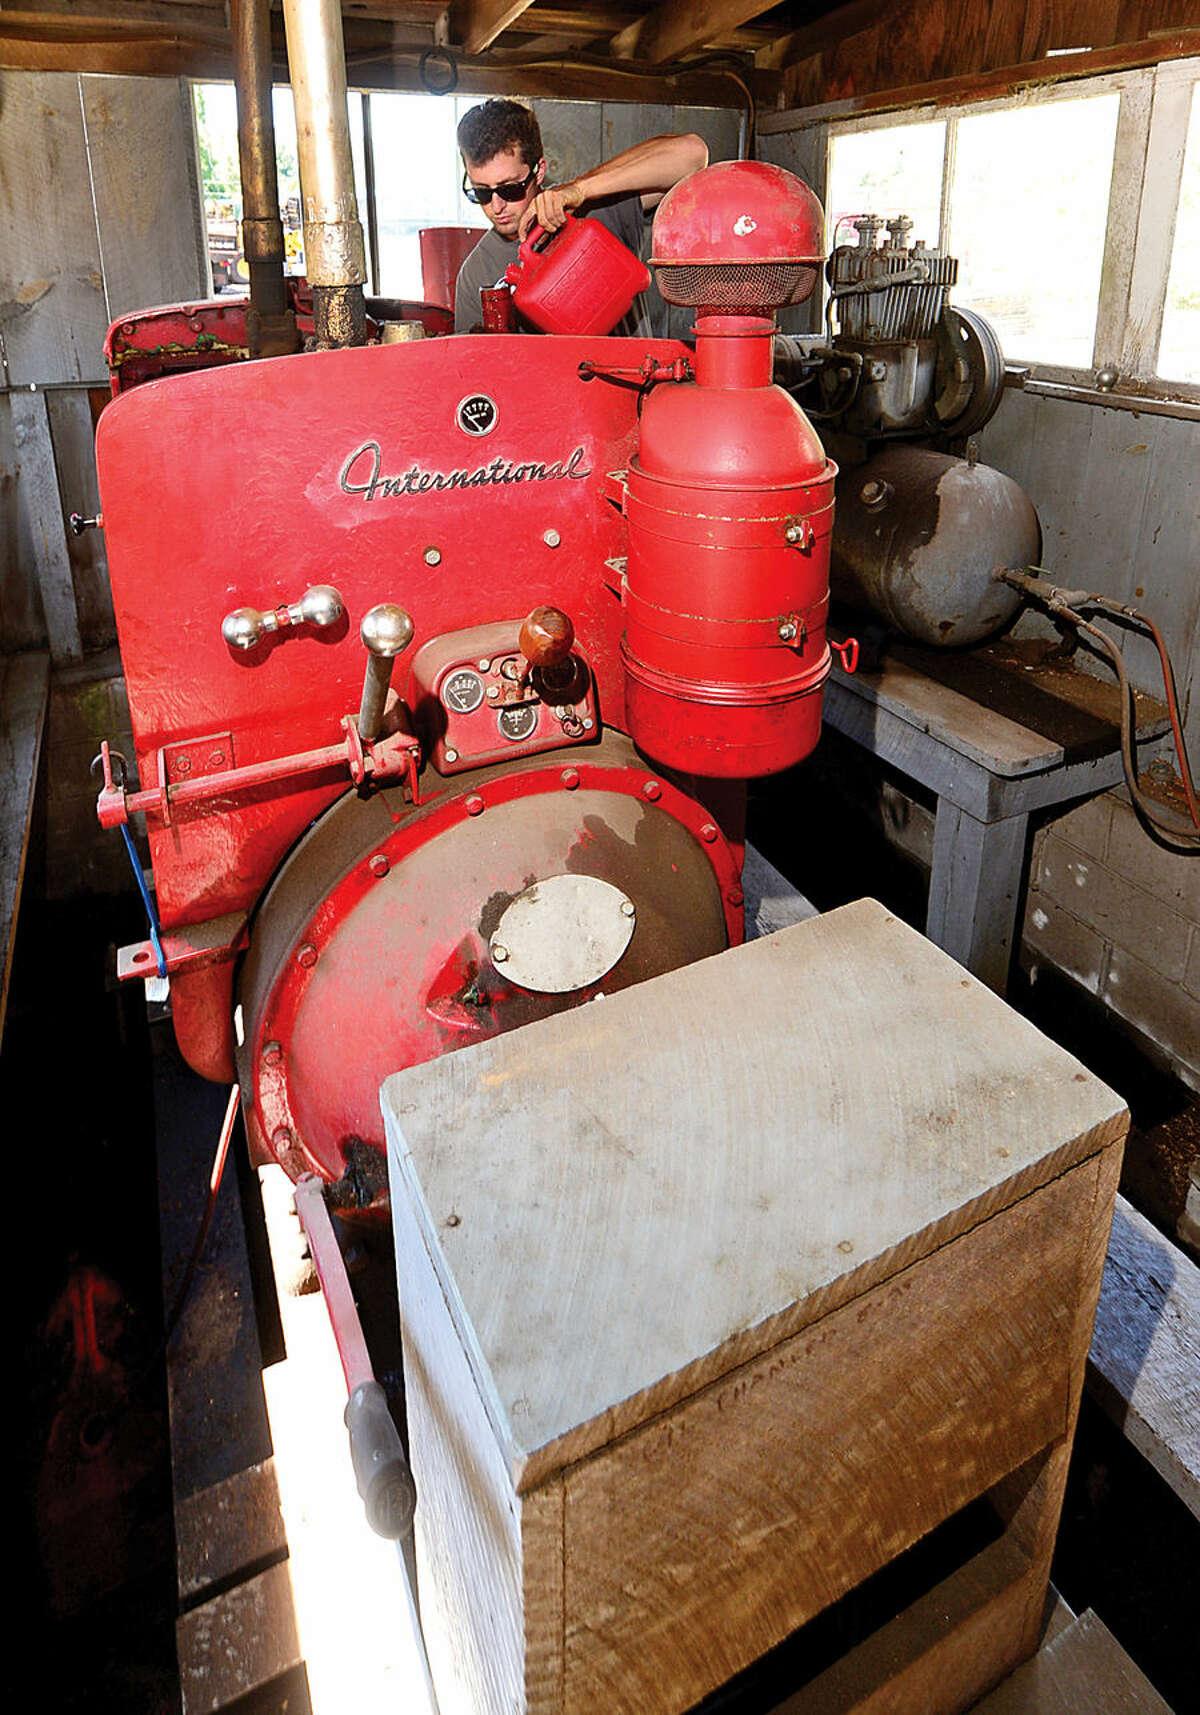 Hour photo / Erik Trautmann Gregory Sawmill employee Carl Strate readies the saw generator,